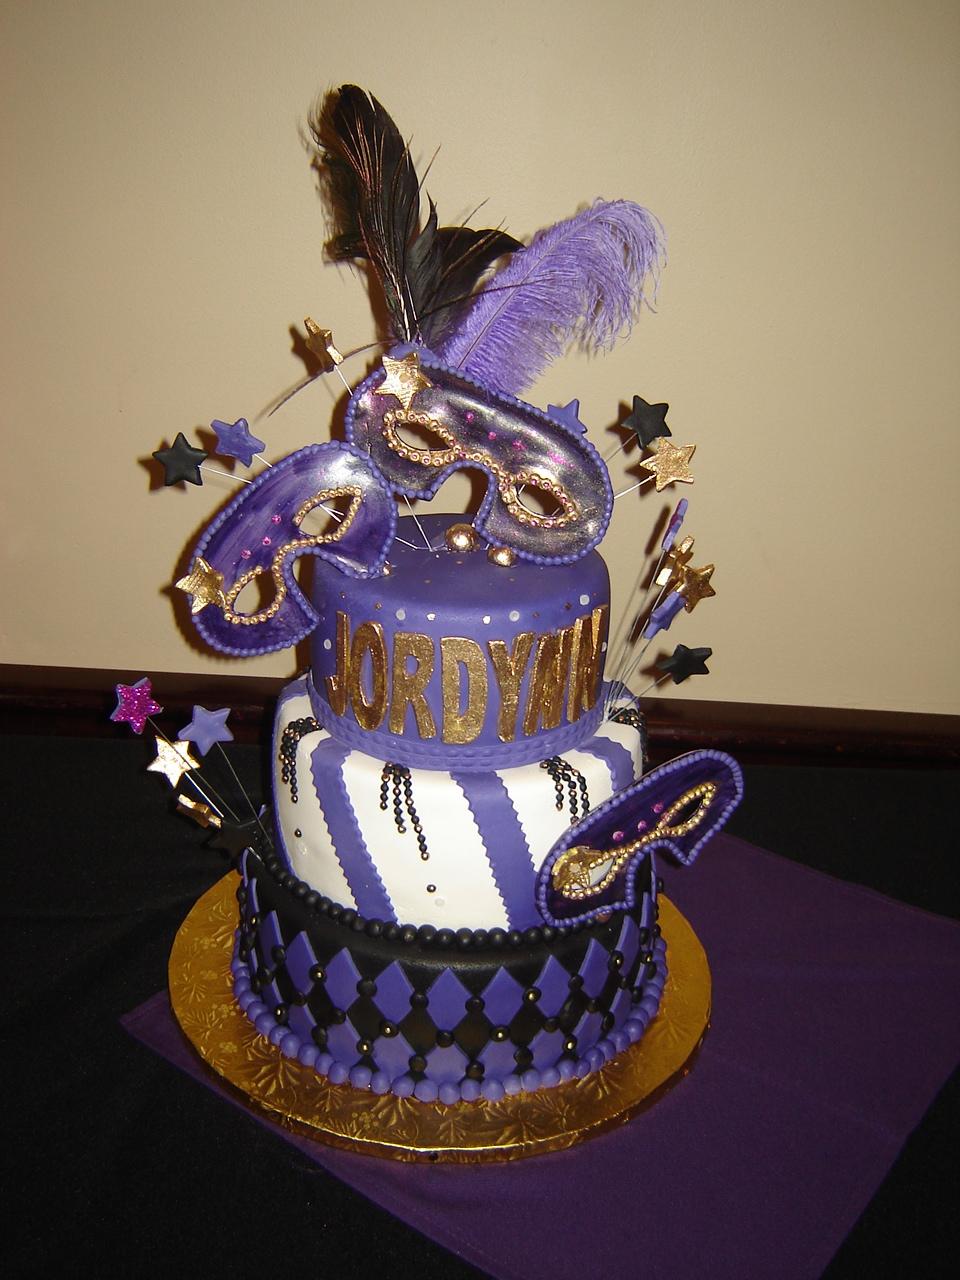 PURPLE MASQUERADE - Olga's Cake Works Corp